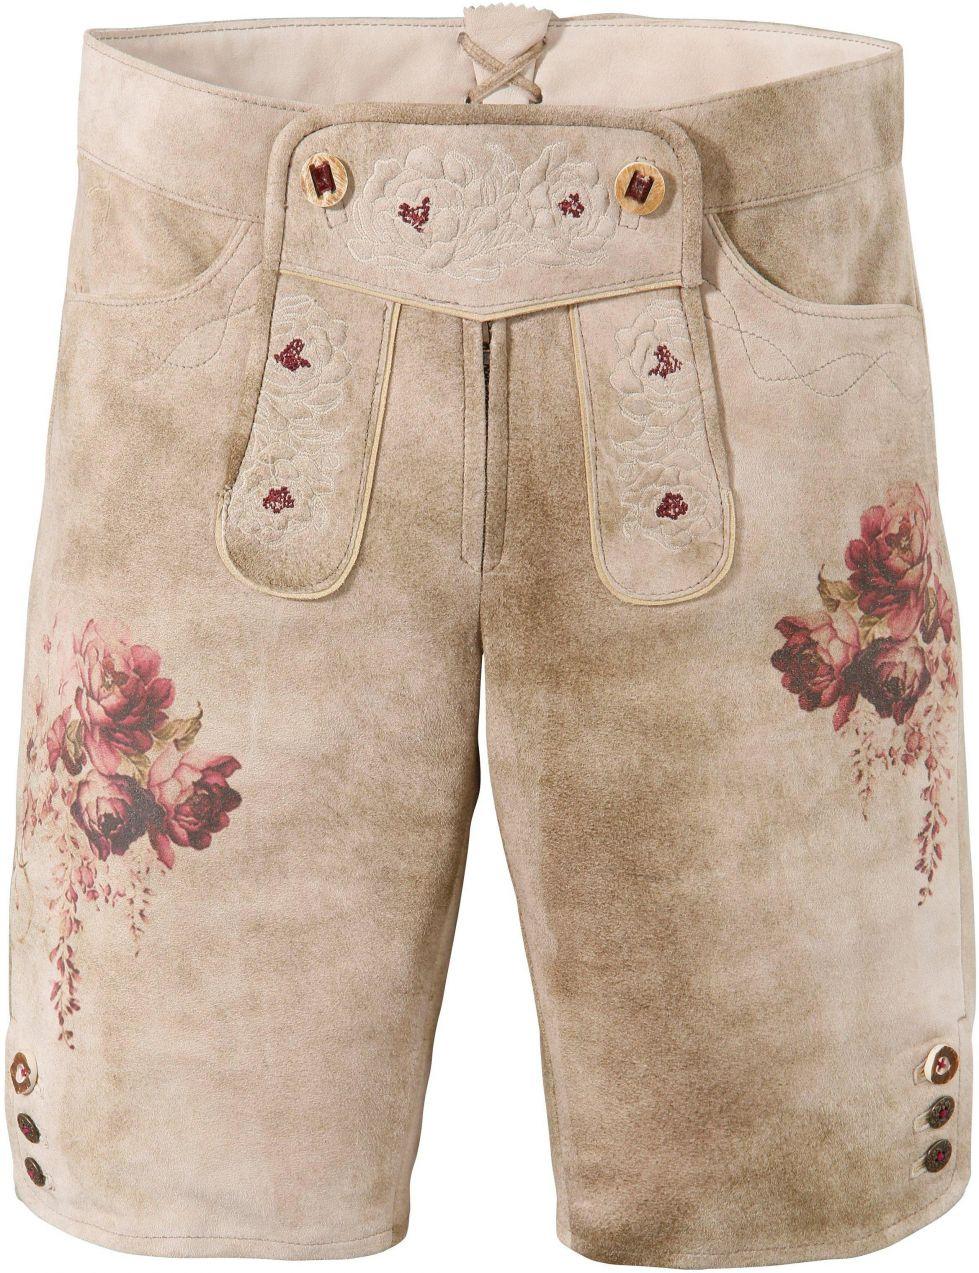 9c9d7bb202e3 Spieth   Wensky Dámske krátke kožené nohavice pruhovaný DEFAULT INVALID